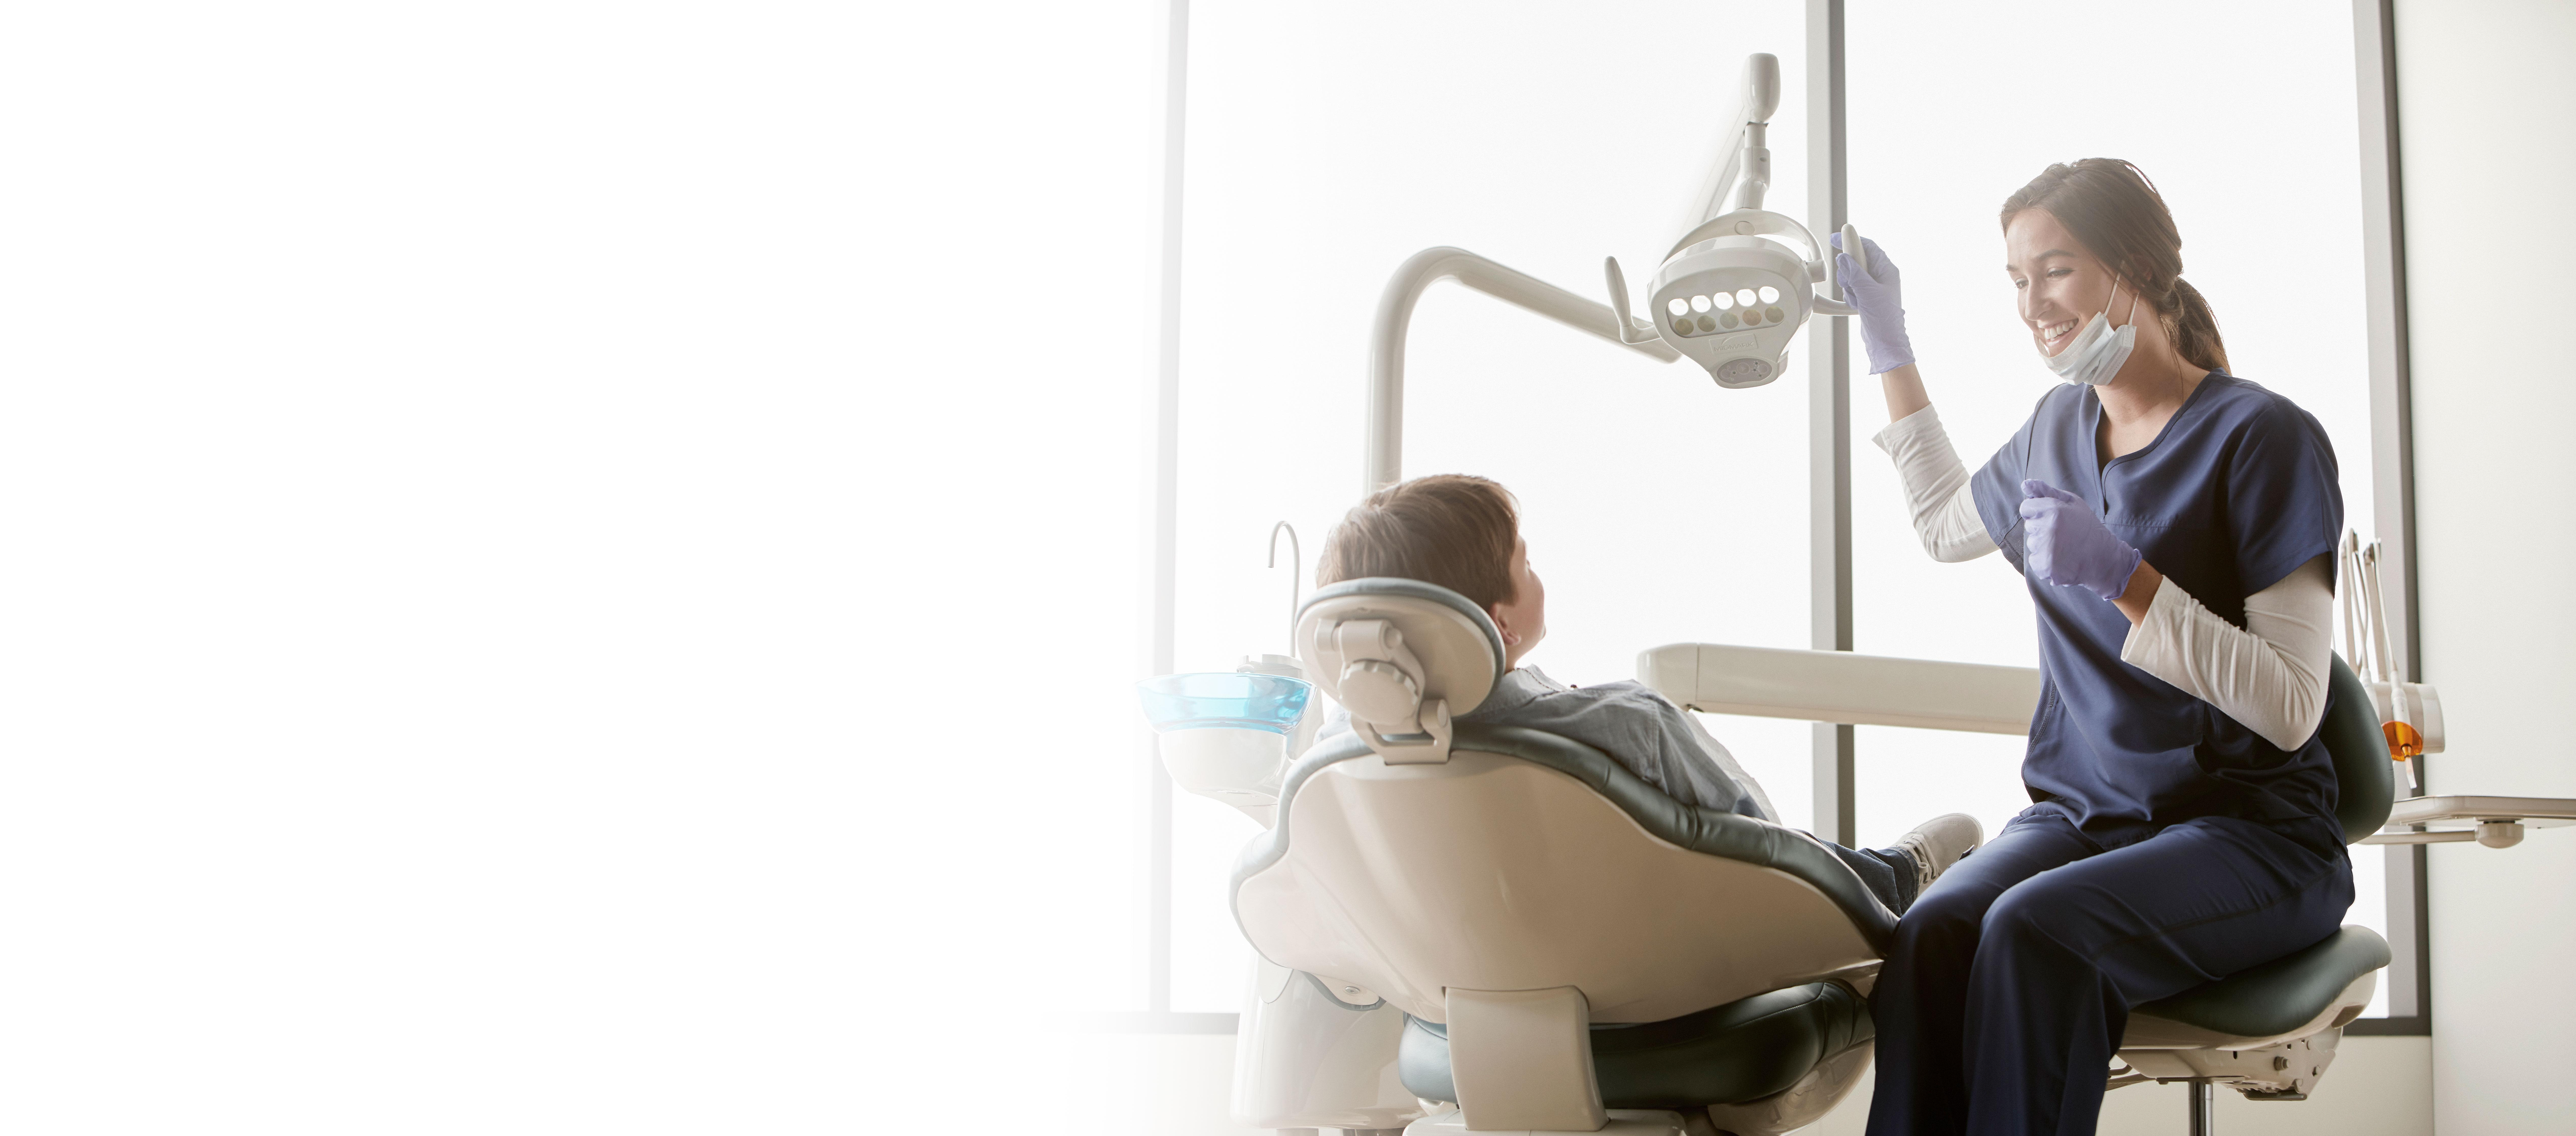 Dental_D7-C_HighPerformance_6193_film-look